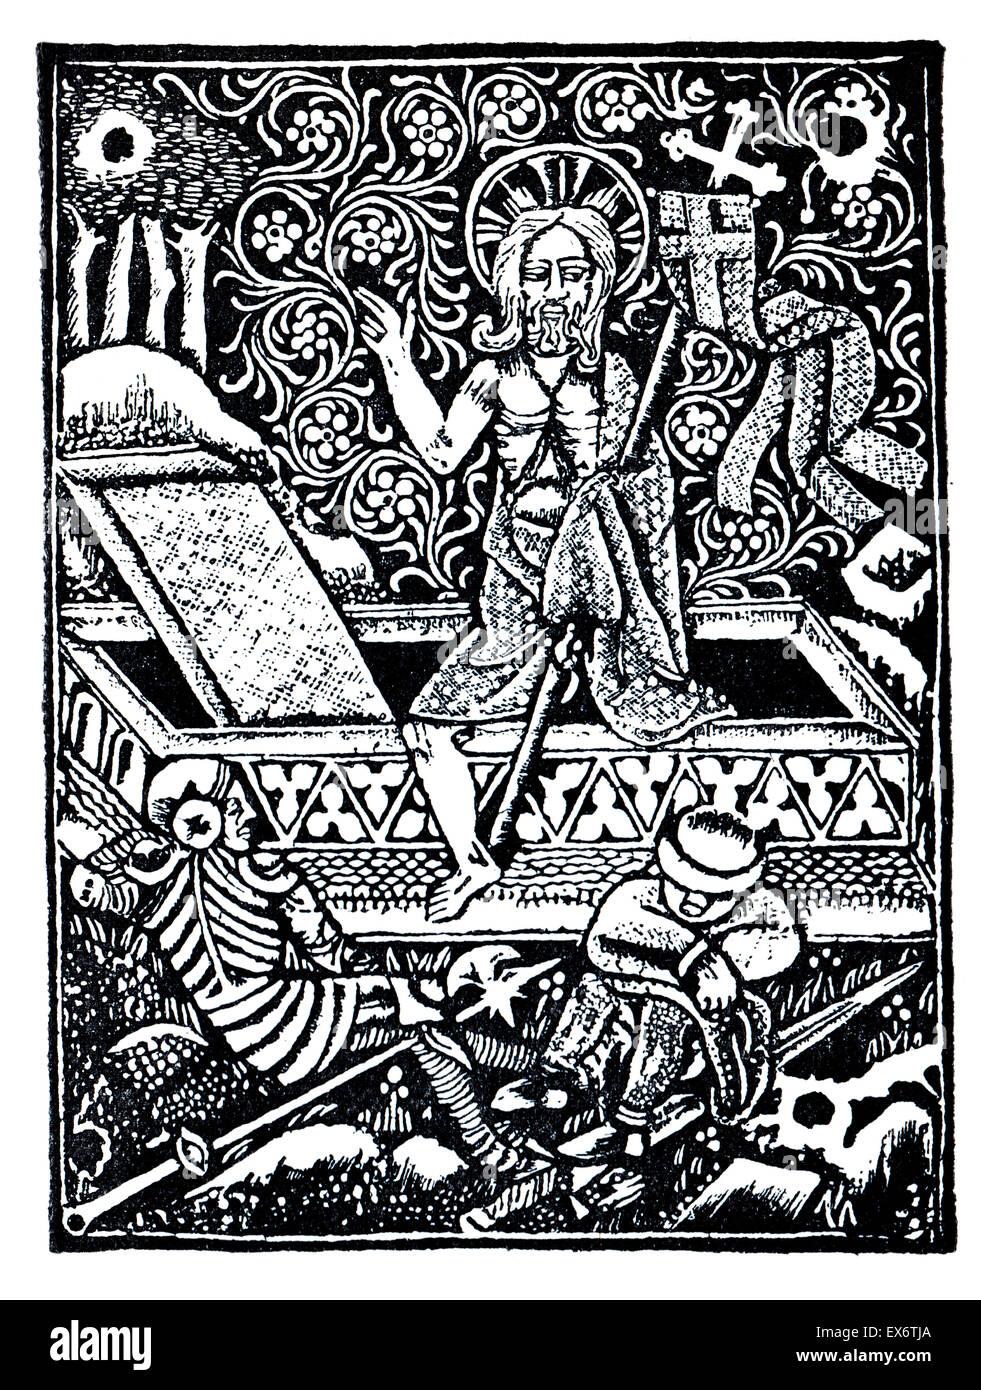 Leiden Christi, 1470 German woodcut  illustration of Christ rising from the dead - Stock Image